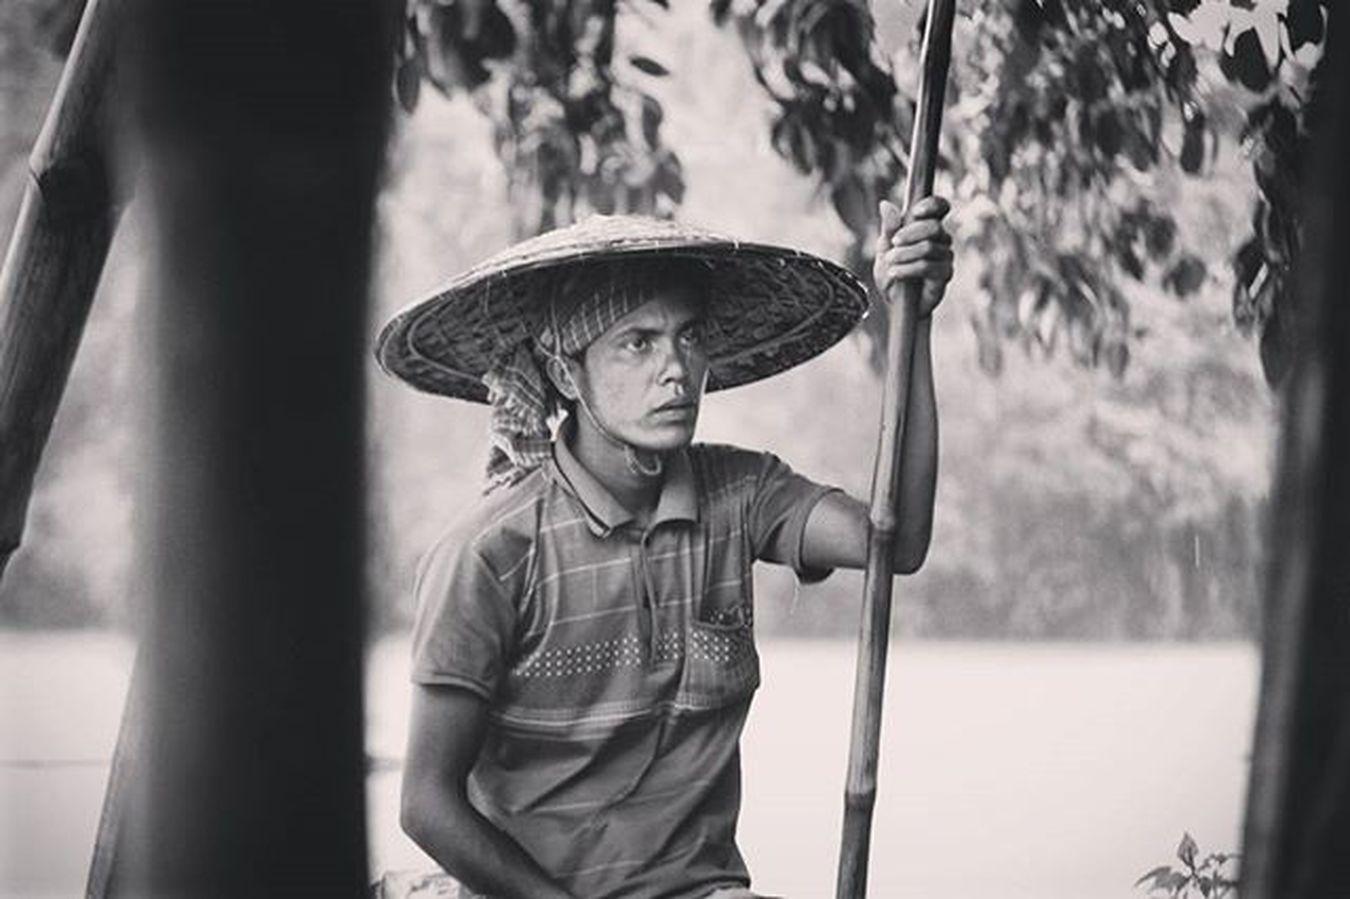 Throw🔙 Lalakhal Sylhet Bangladesh Culturegram Traveldiaries NikonD5200 Nikon Boating Boatsman Thisisbangladesh Bangladeshiphotographer Visitbangladesh Bnw Bnw_captures Bnw_life Bnw_society Humanstory Nikonphotographers Monsoon RainyDay Nikonphotography Labour Travelingram Photographersofbangladesh photogrid photogram photography travelbangladesh